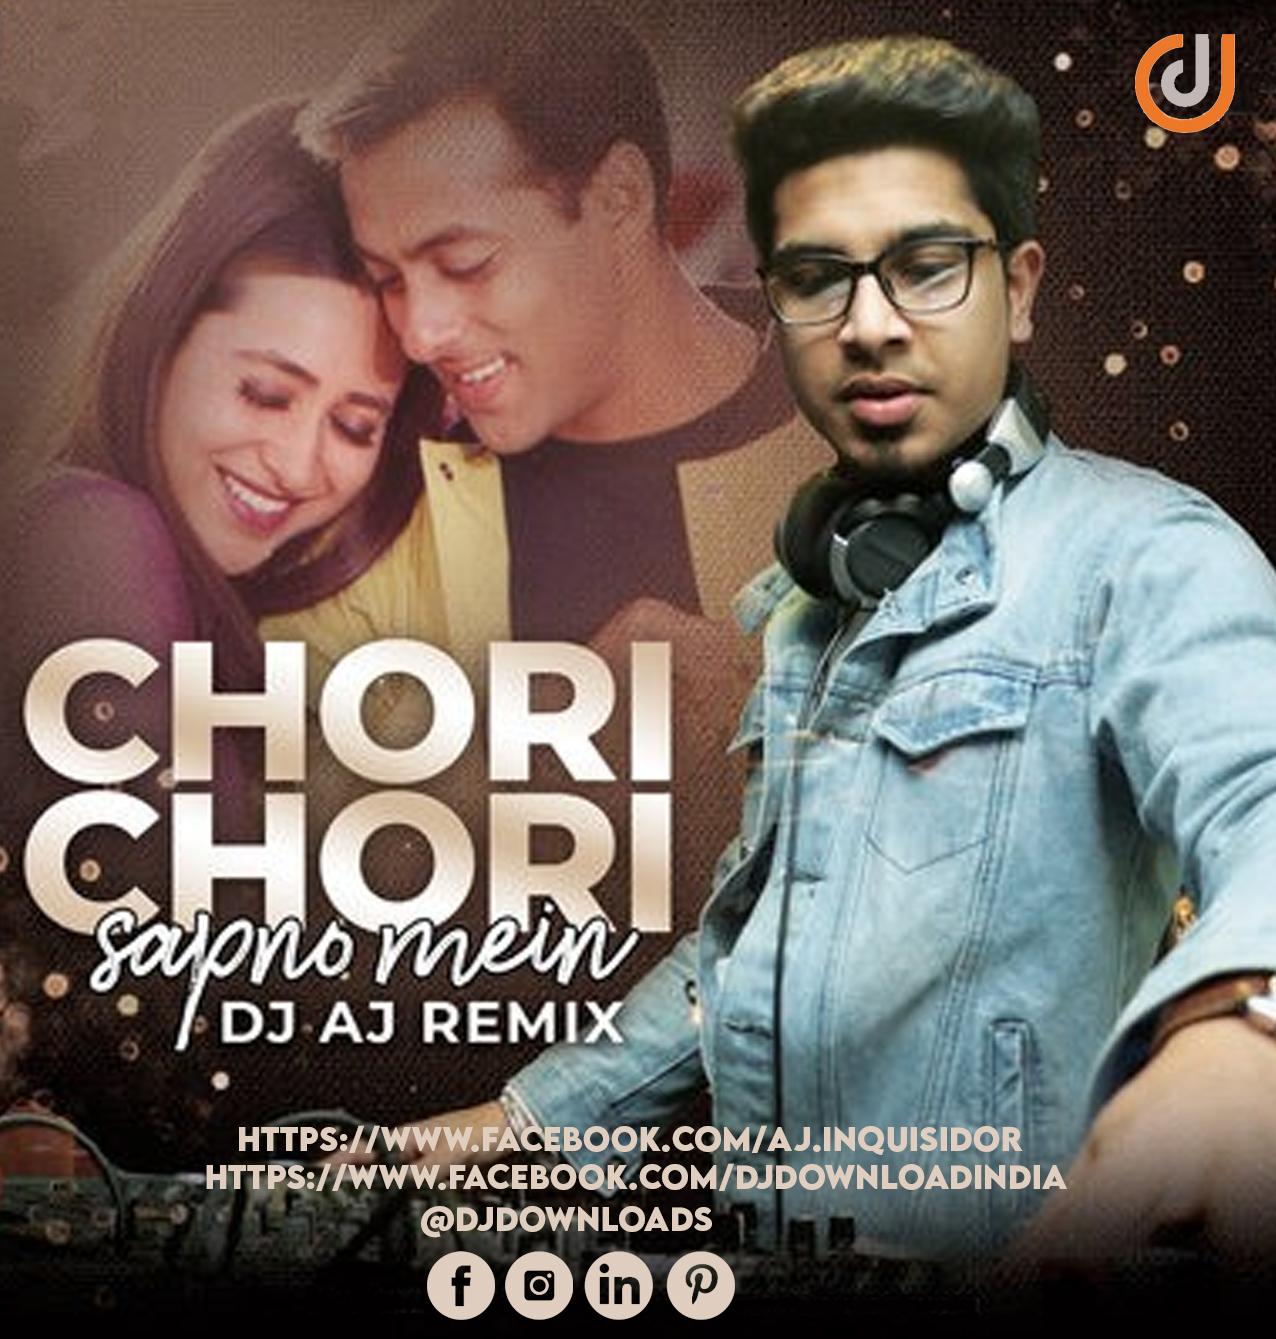 Chori Chori Sapno Mein (Remix) - DJ AJ